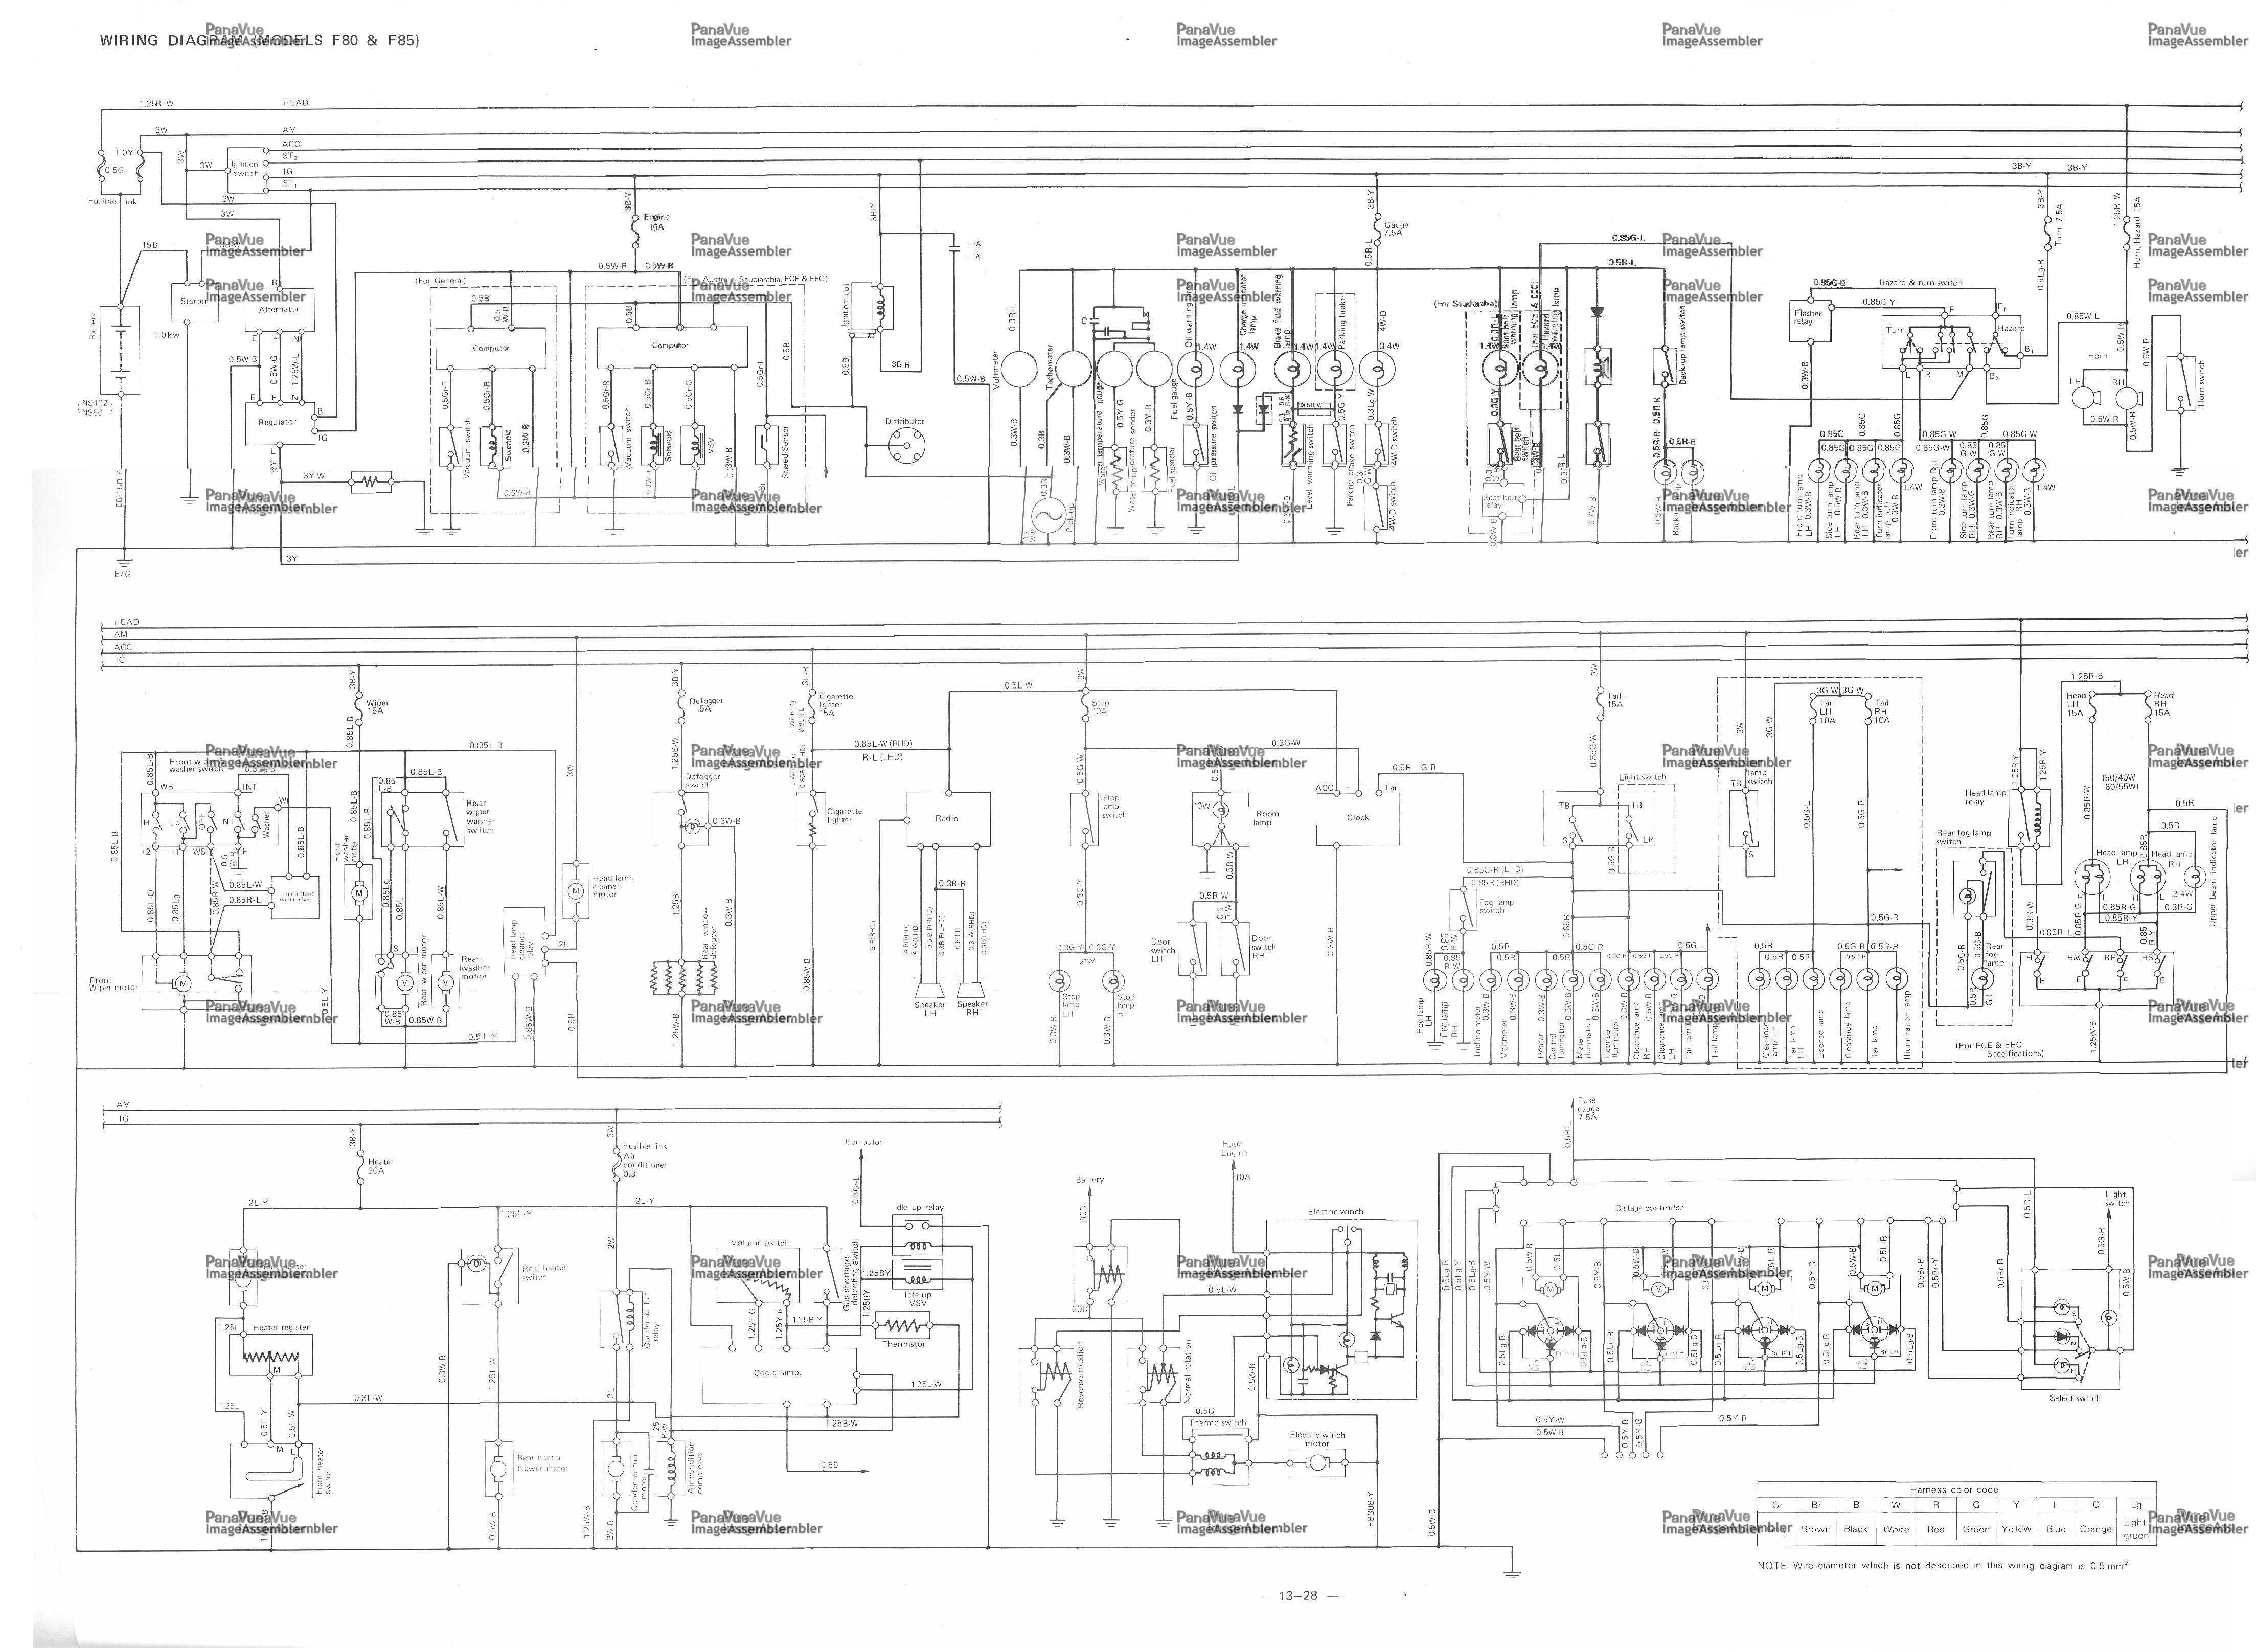 Daihatsu Wiring Diagrams - 95 Mazda B4000 4 0l Engine Diagram - wiring .losdol2.jeanjaures37.frWiring Diagram